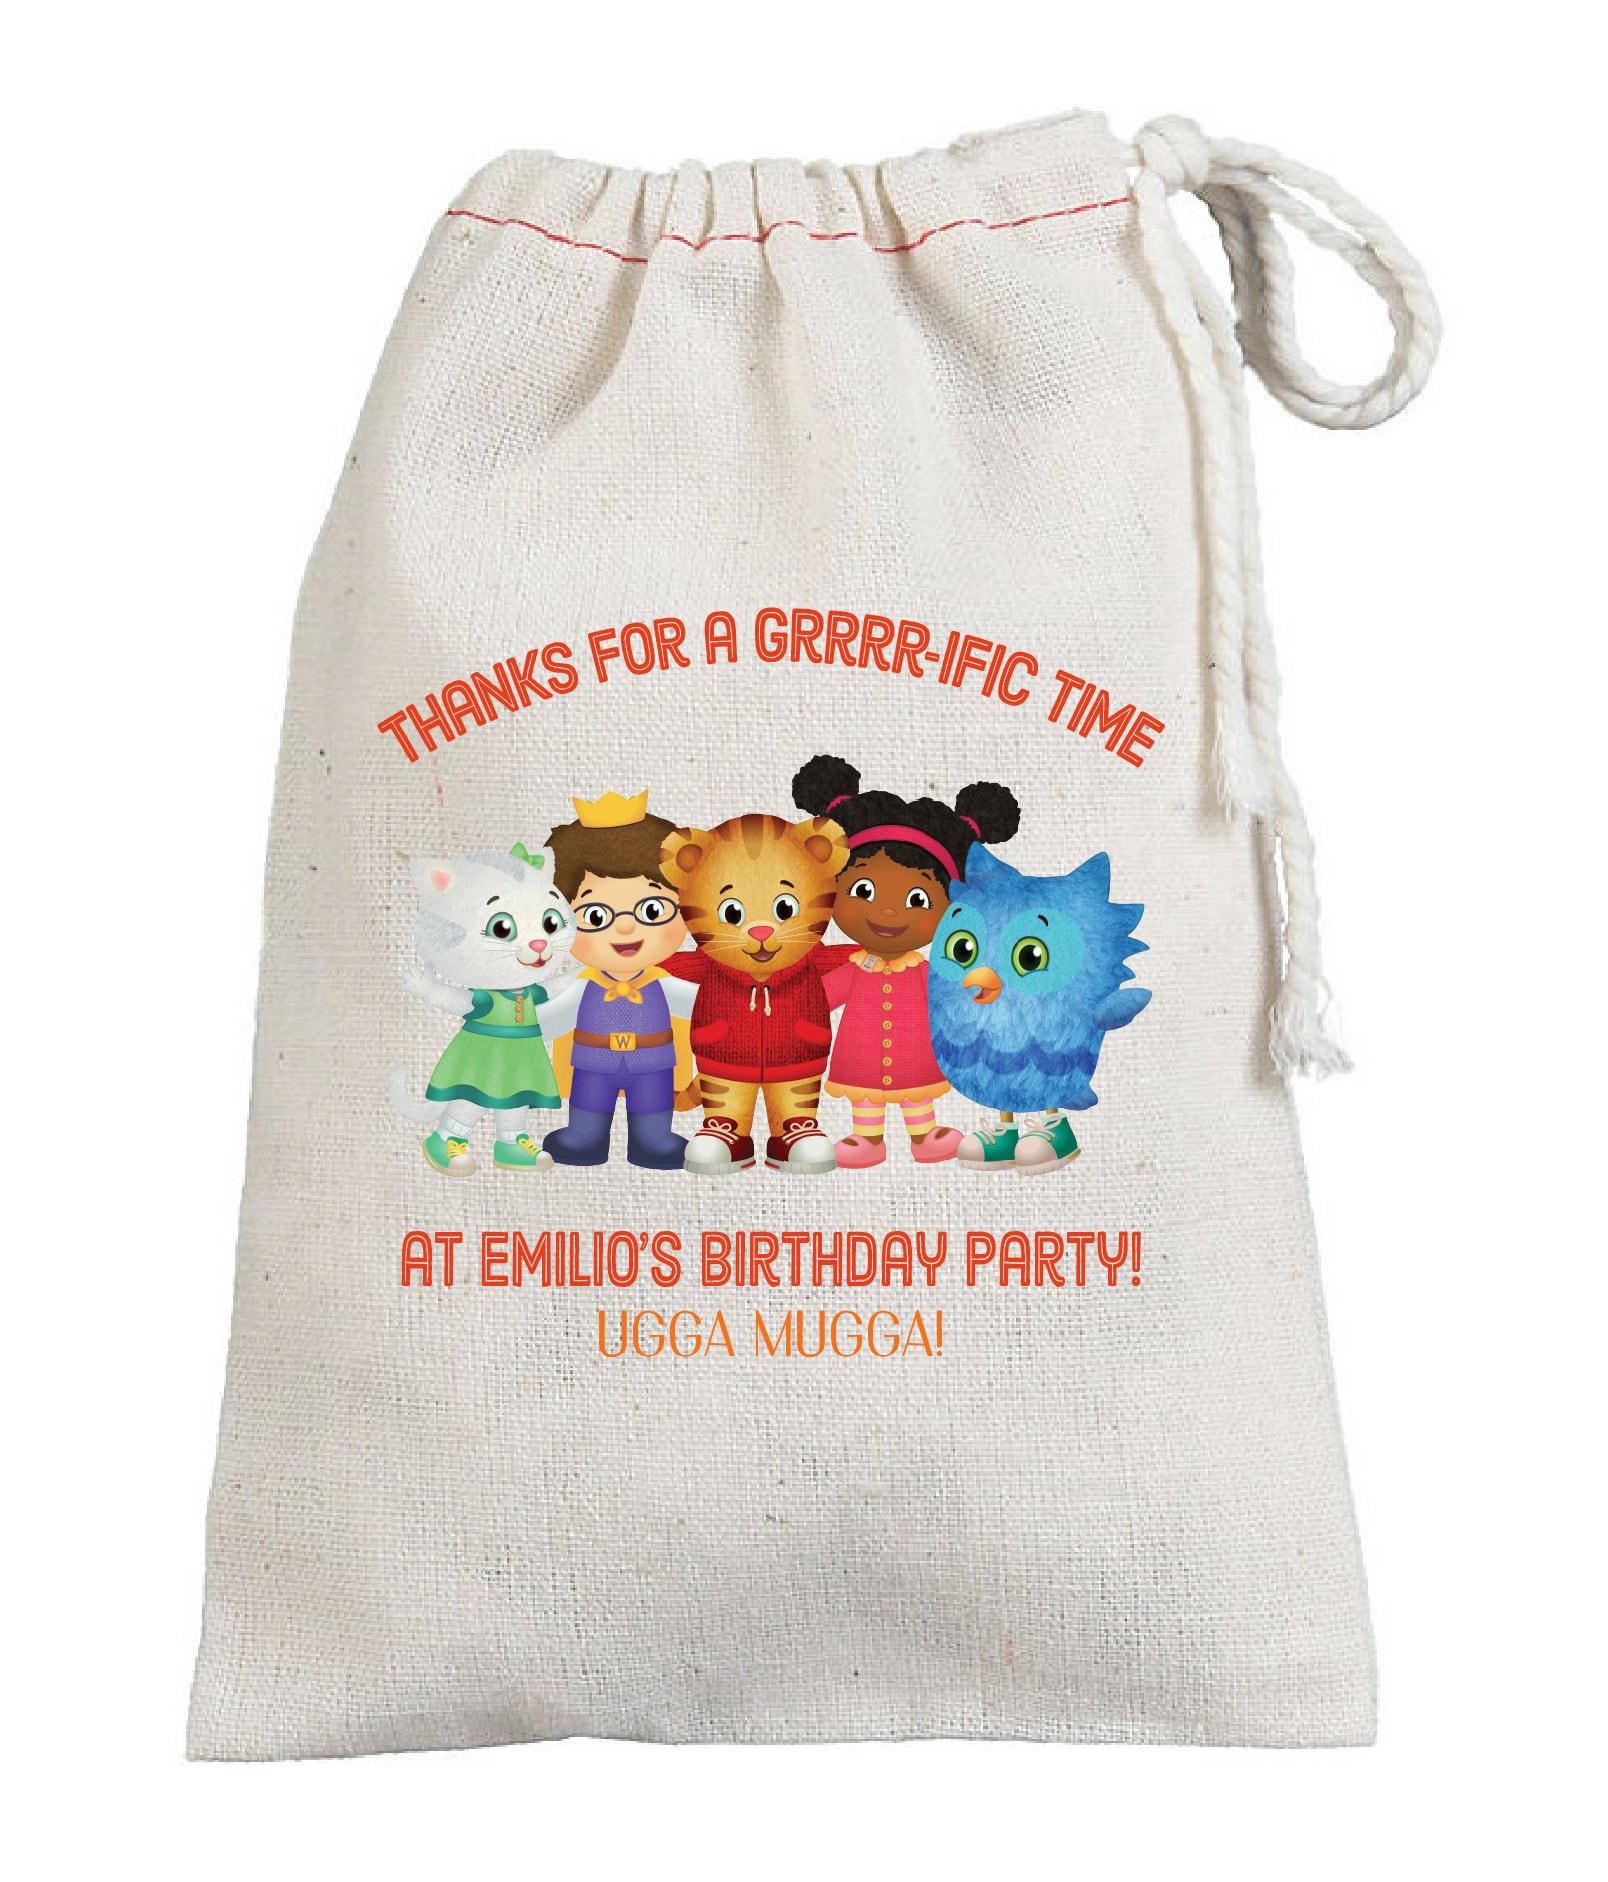 Daniel Tiger Birthday Party Favor Bags Grrr-rific party | Etsy